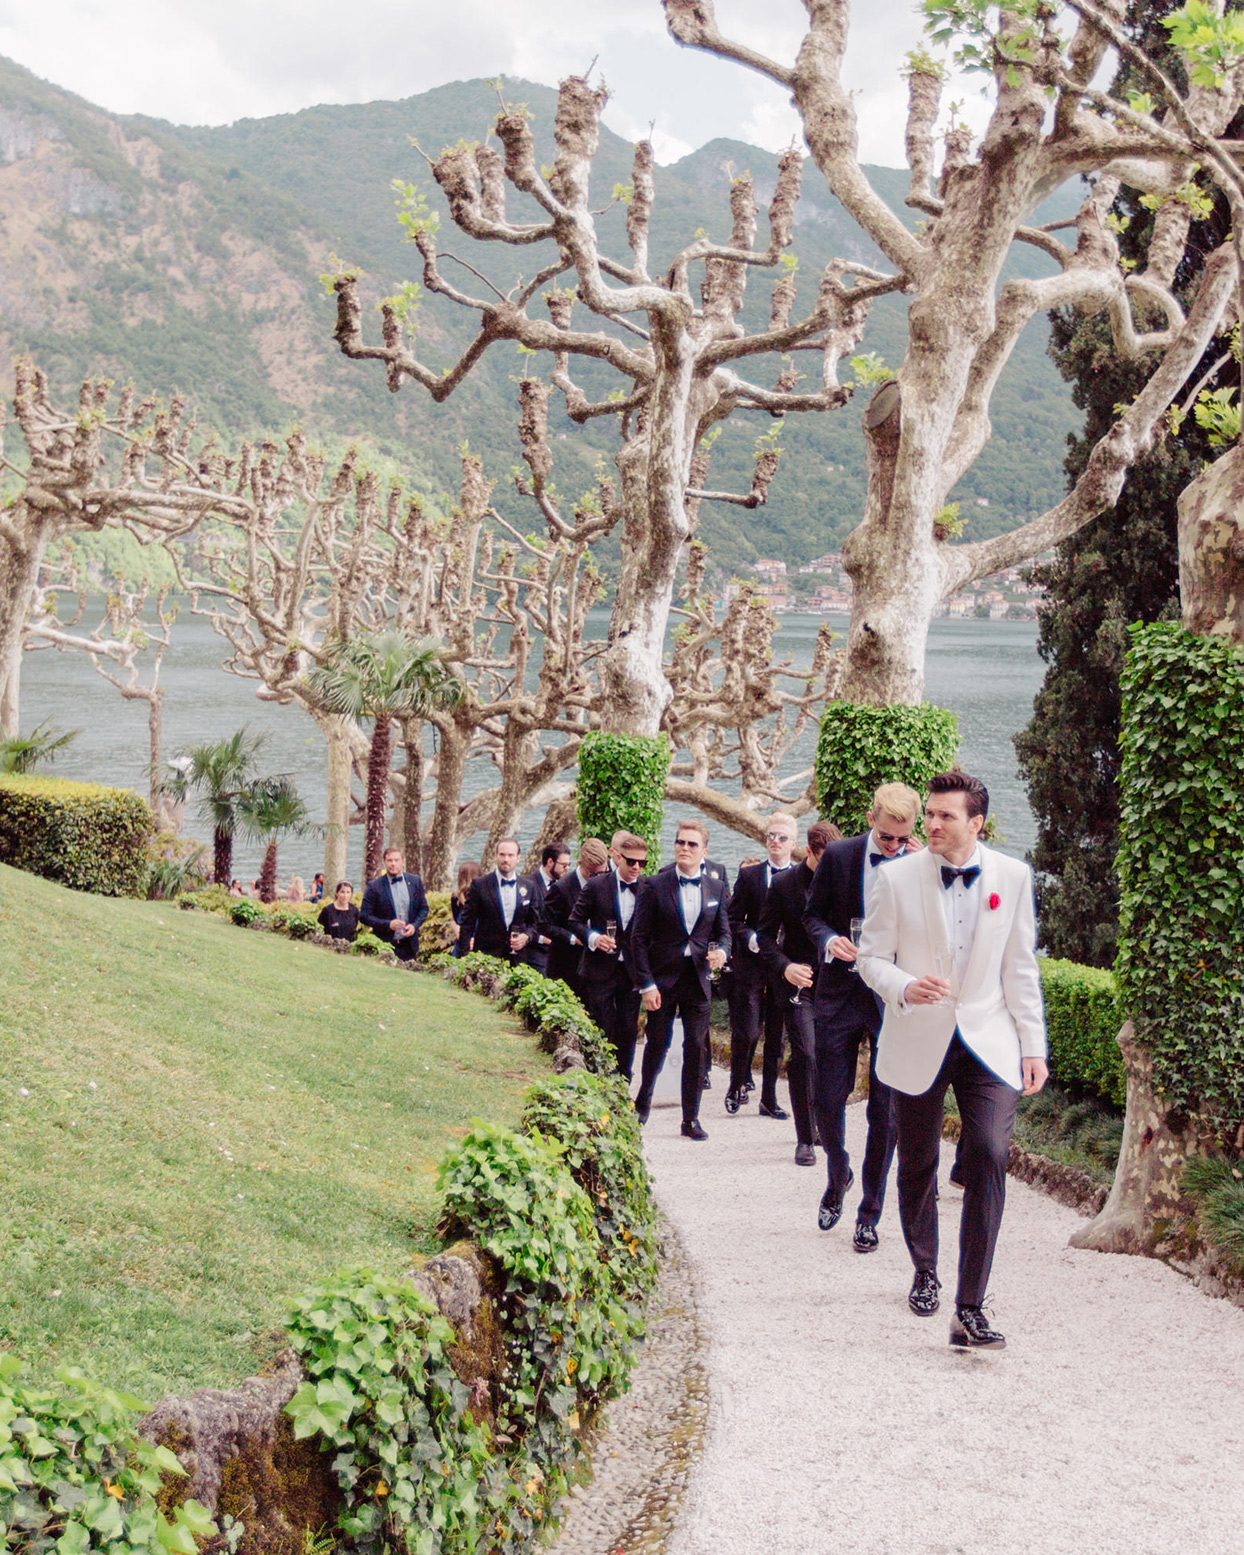 kiira arthur wedding groomsmen walking up rustic path